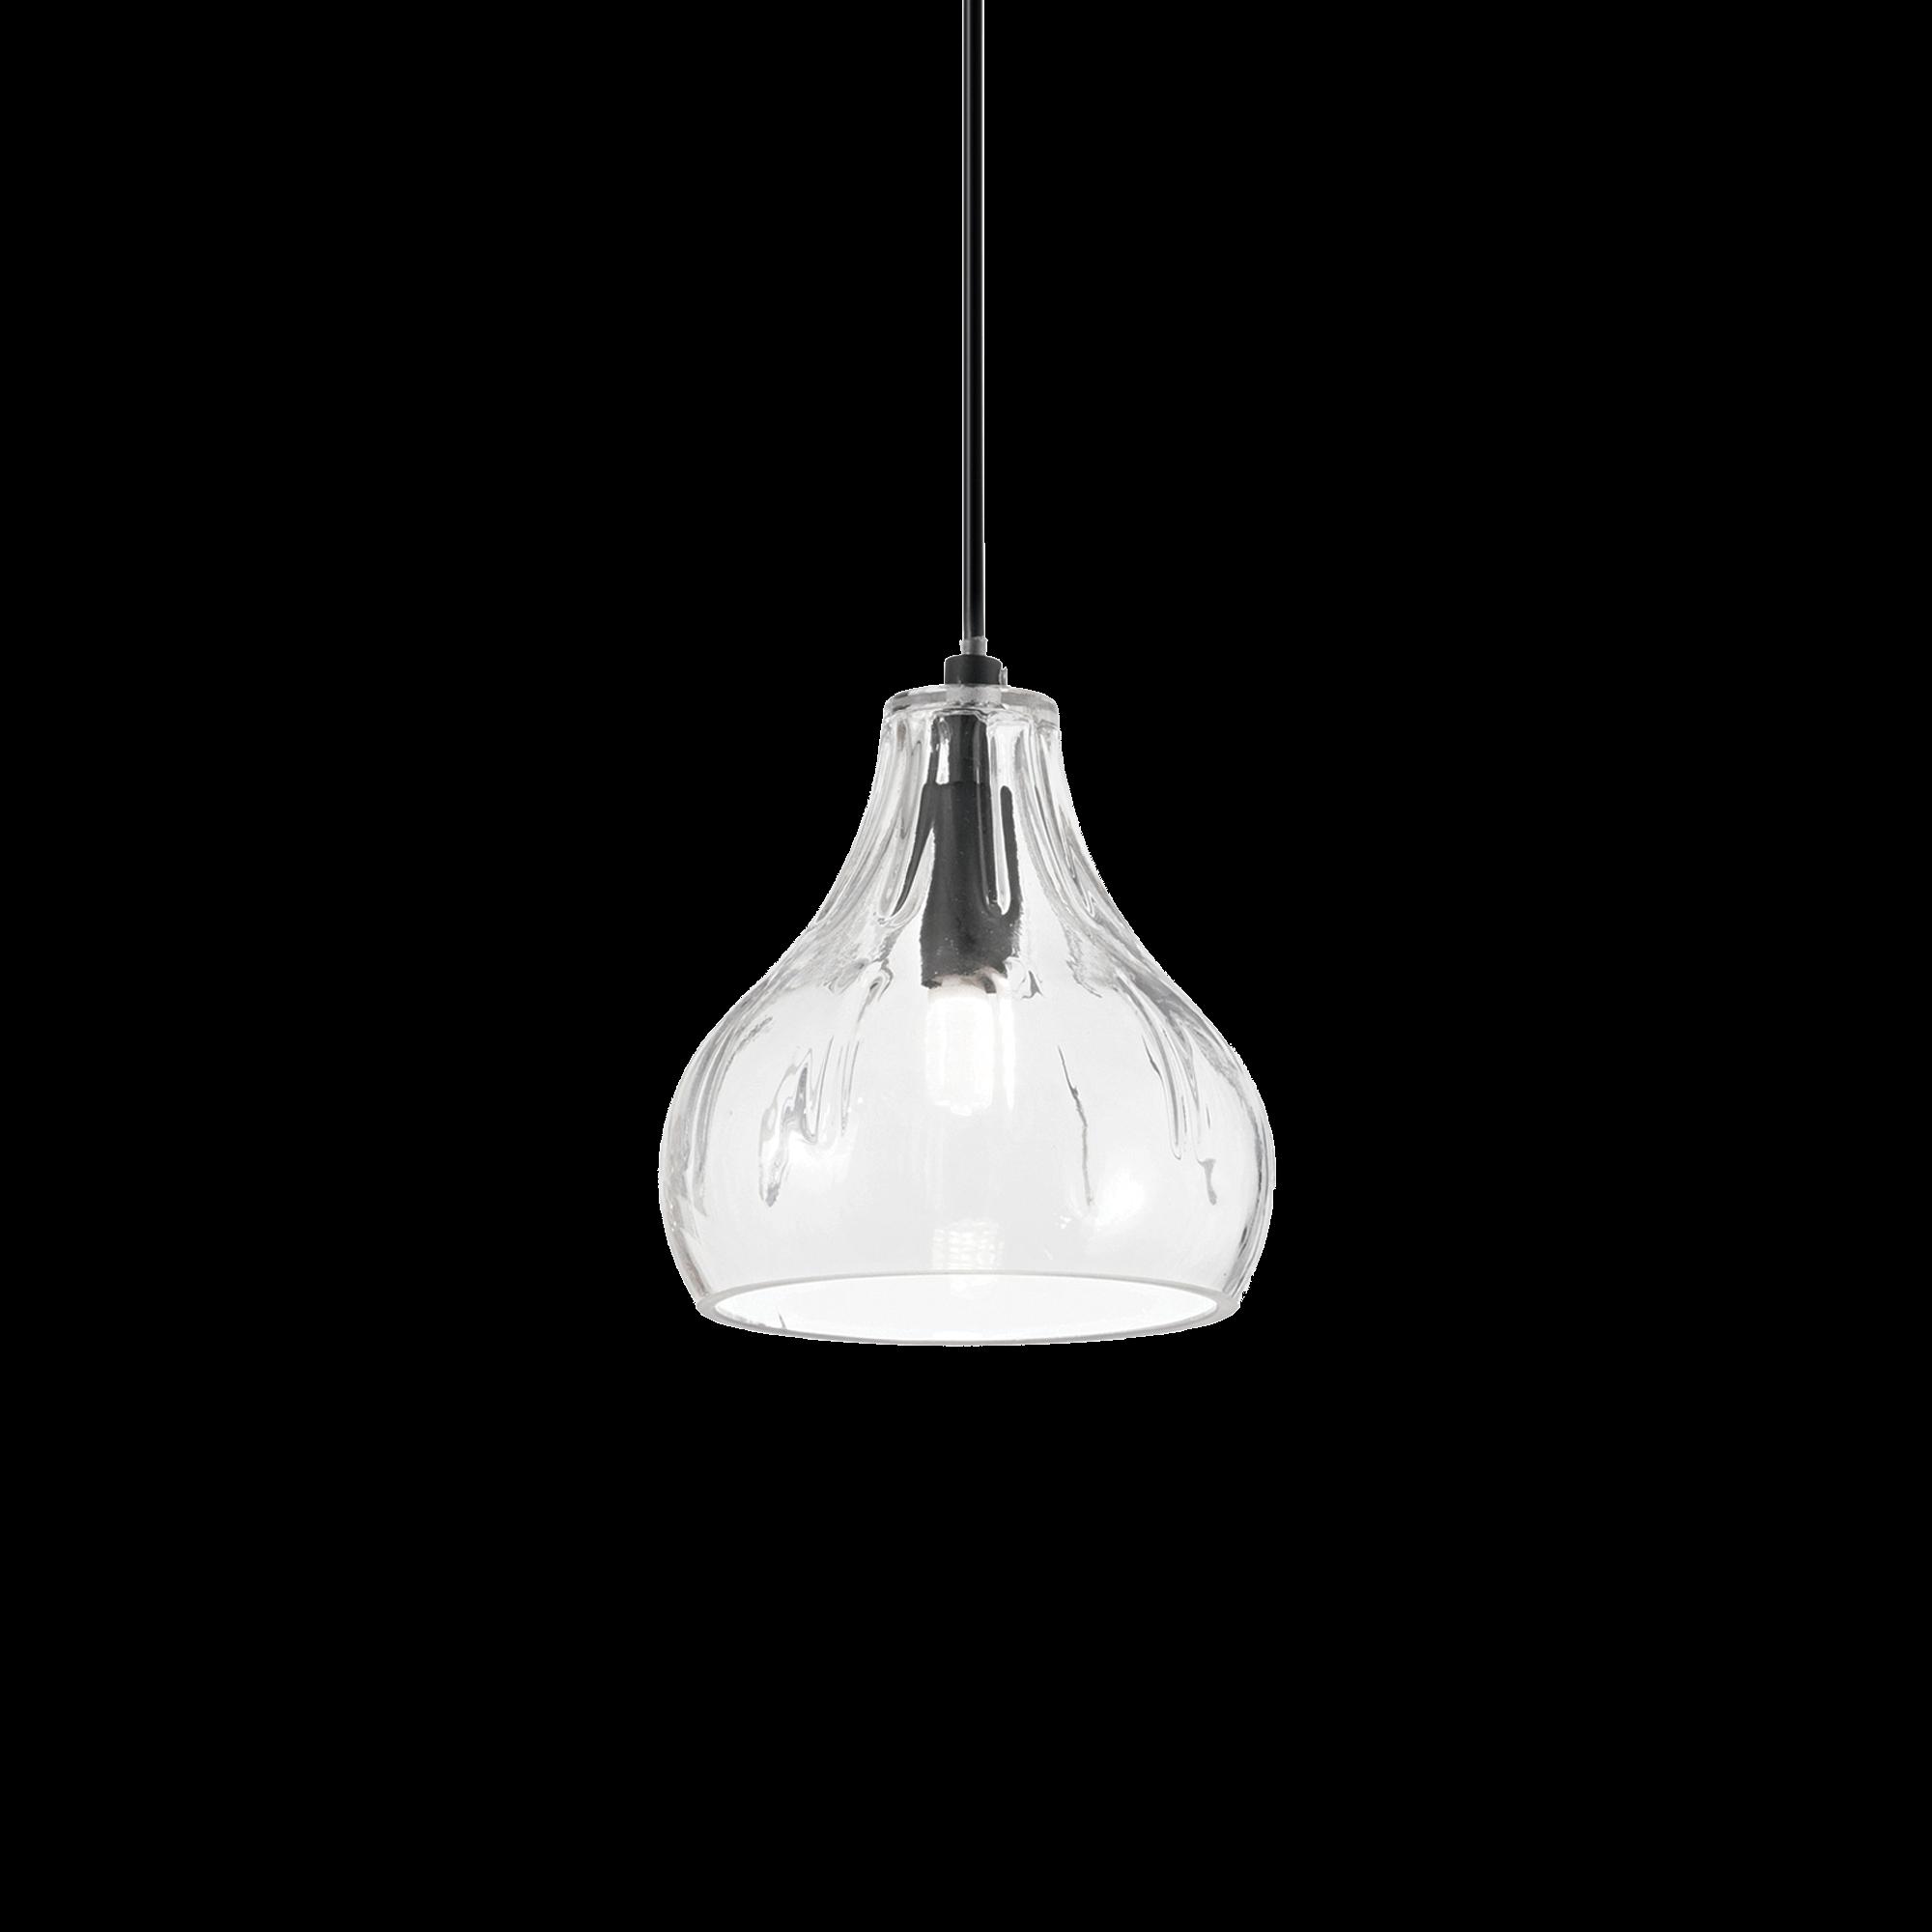 Ideal Lux 167022 COGNAC-4 SP1 lámpa függeszték